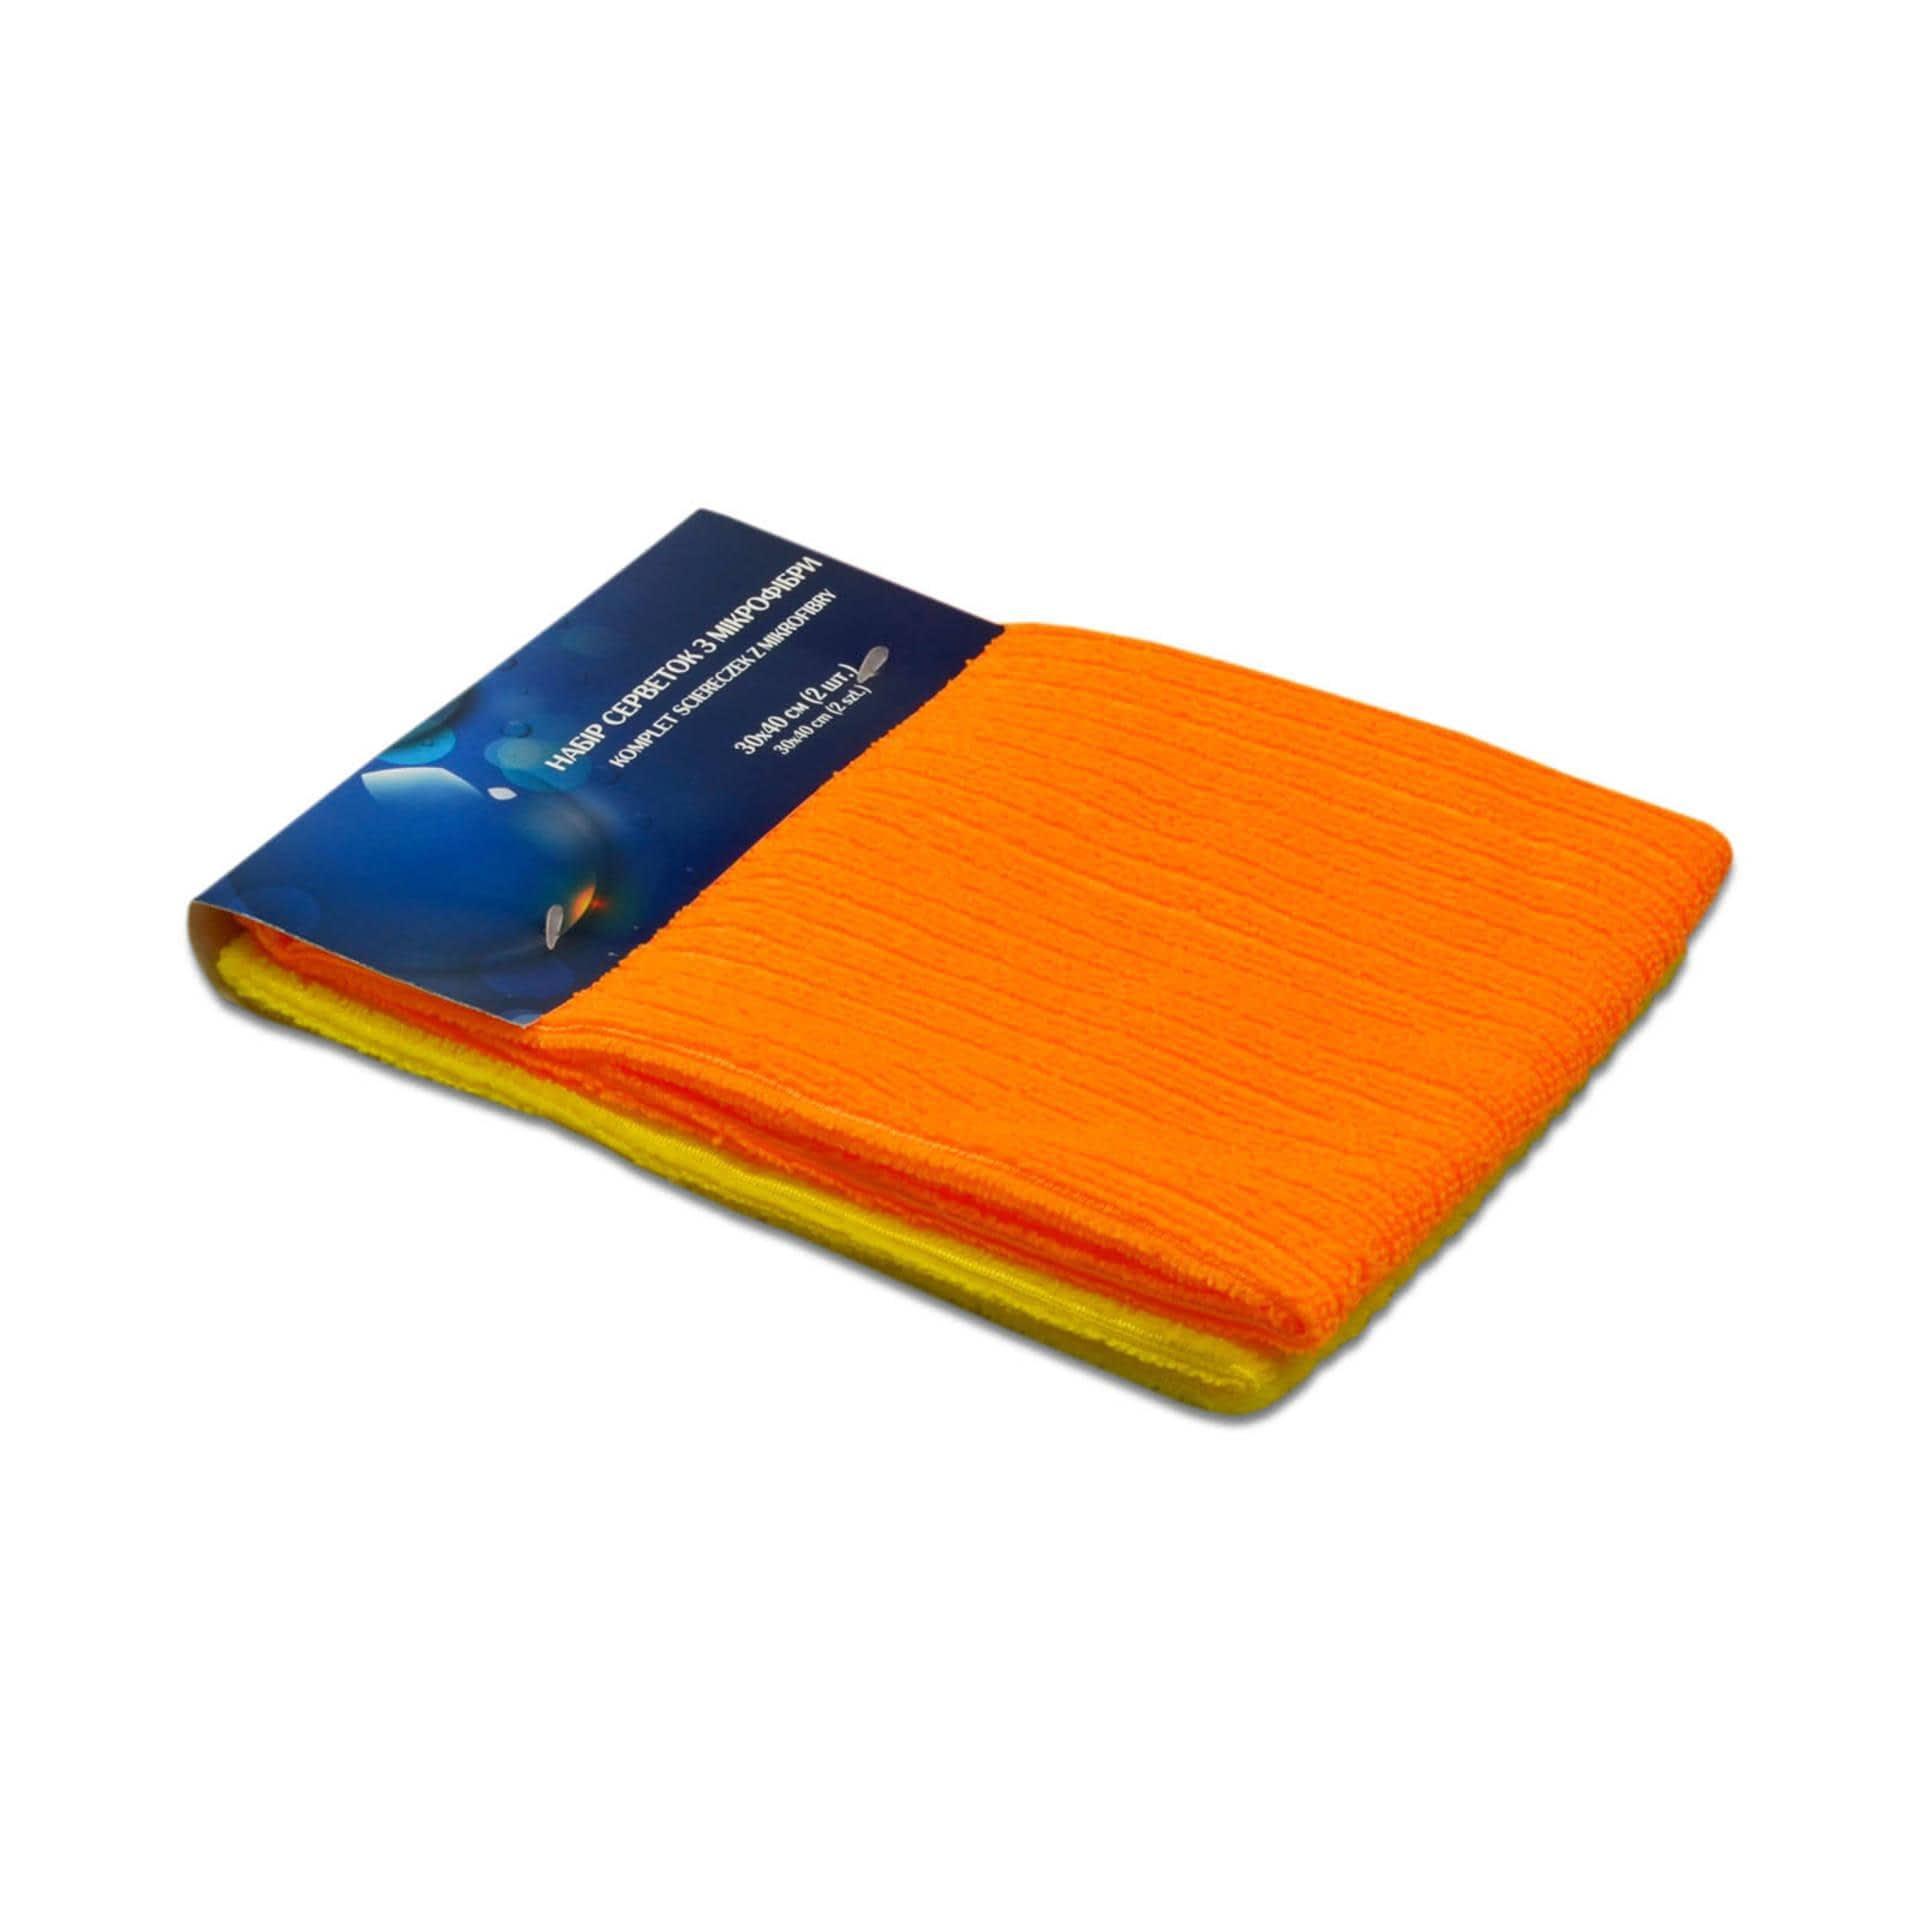 Ткани кухонные полотенца - Набор салфеток кухонных микрофибра жёлто-оранжевые  30х40 см  2шт.